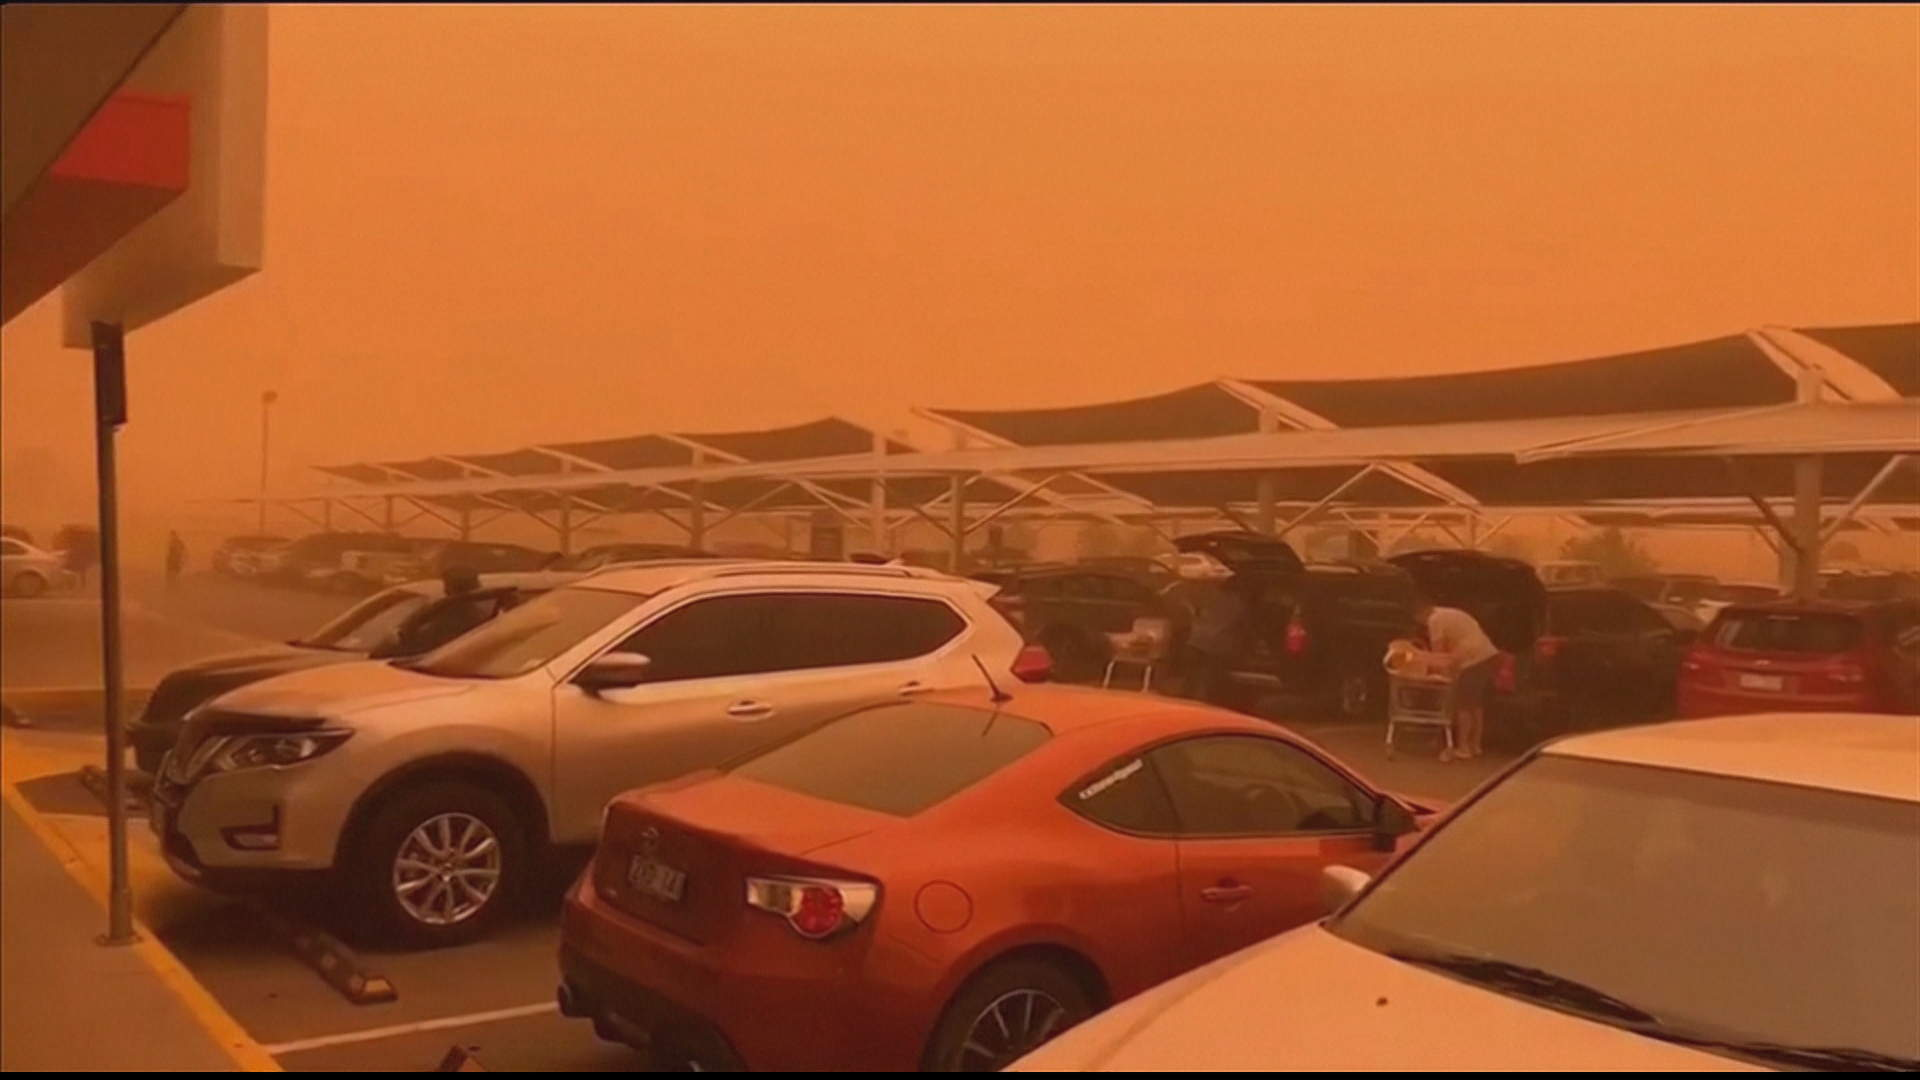 Australia bushfires' smoke blankets Sydney - One News Page ...